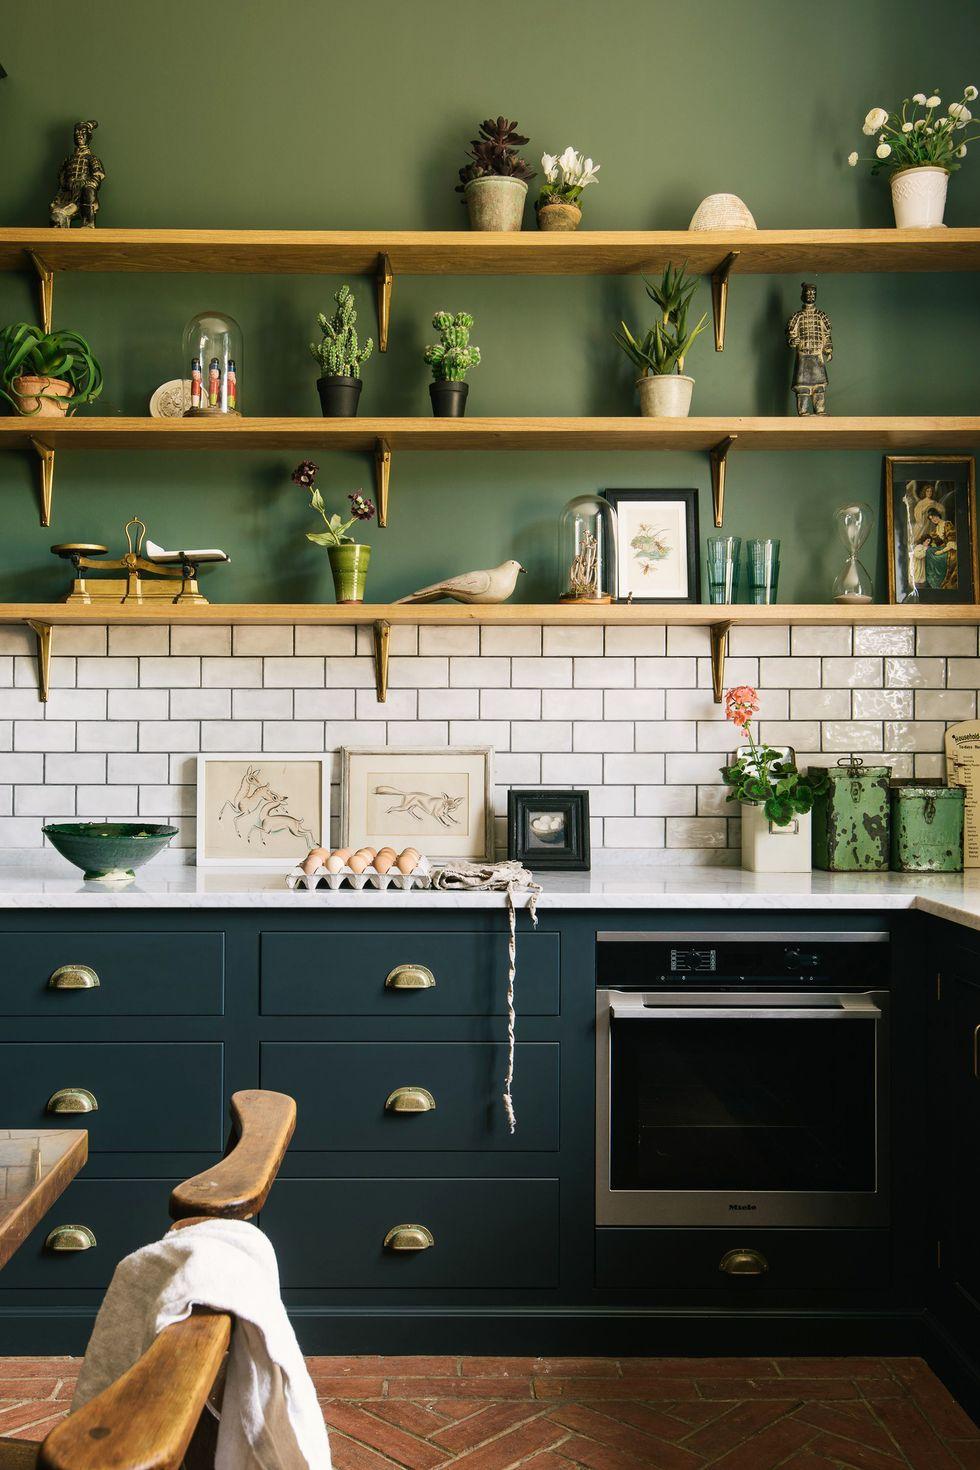 55 Chic Kitchen Backsplash Ideas That Will Transform the Entire Room